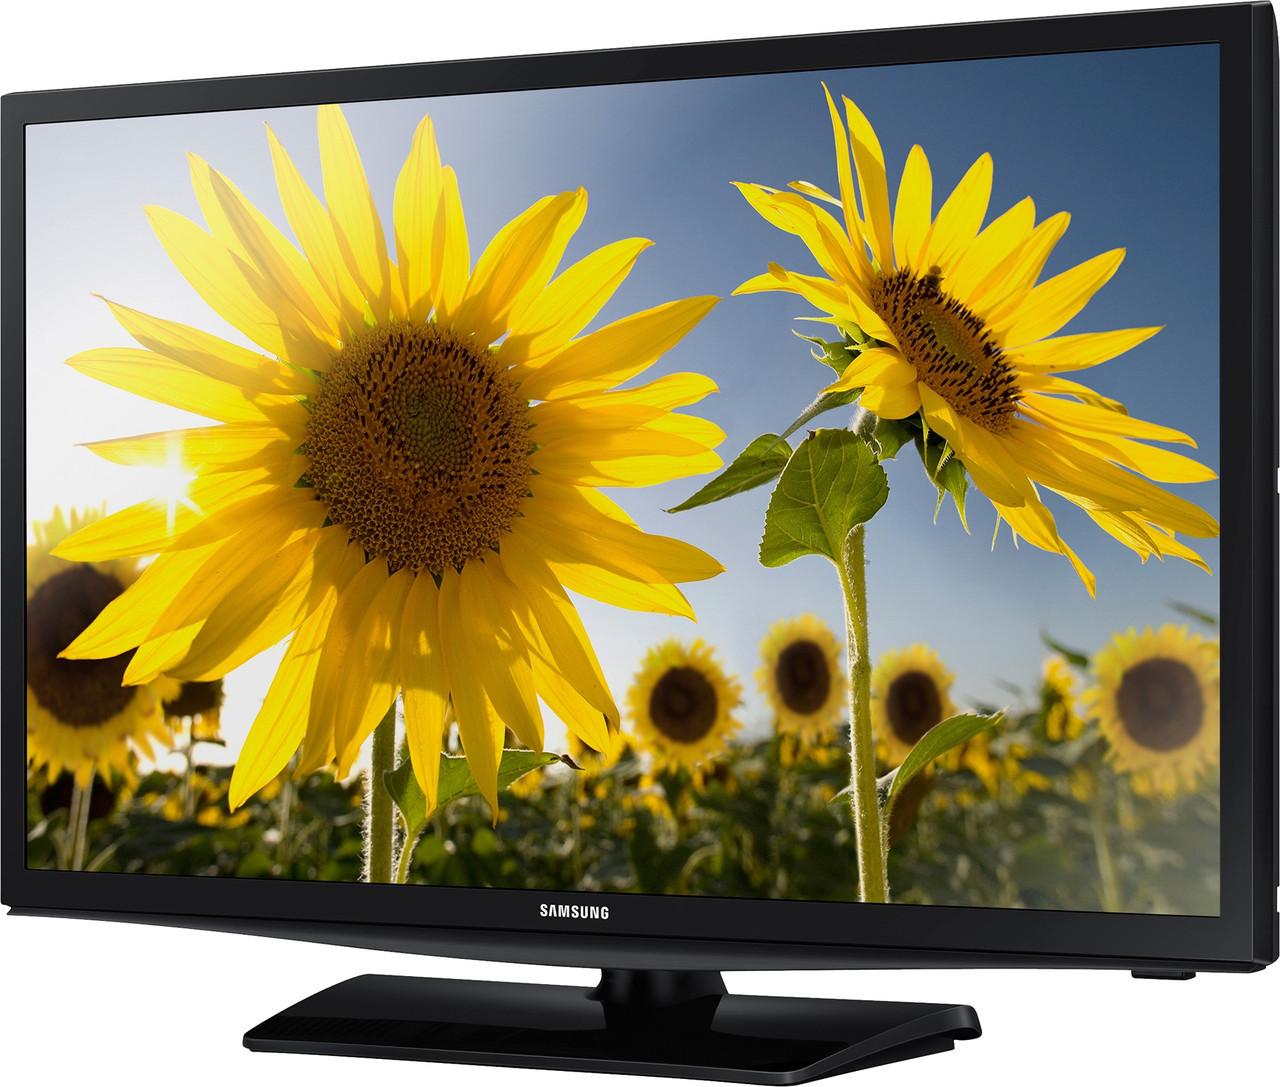 Телевизор Samsung UE32H4000 (100Гц, HD)